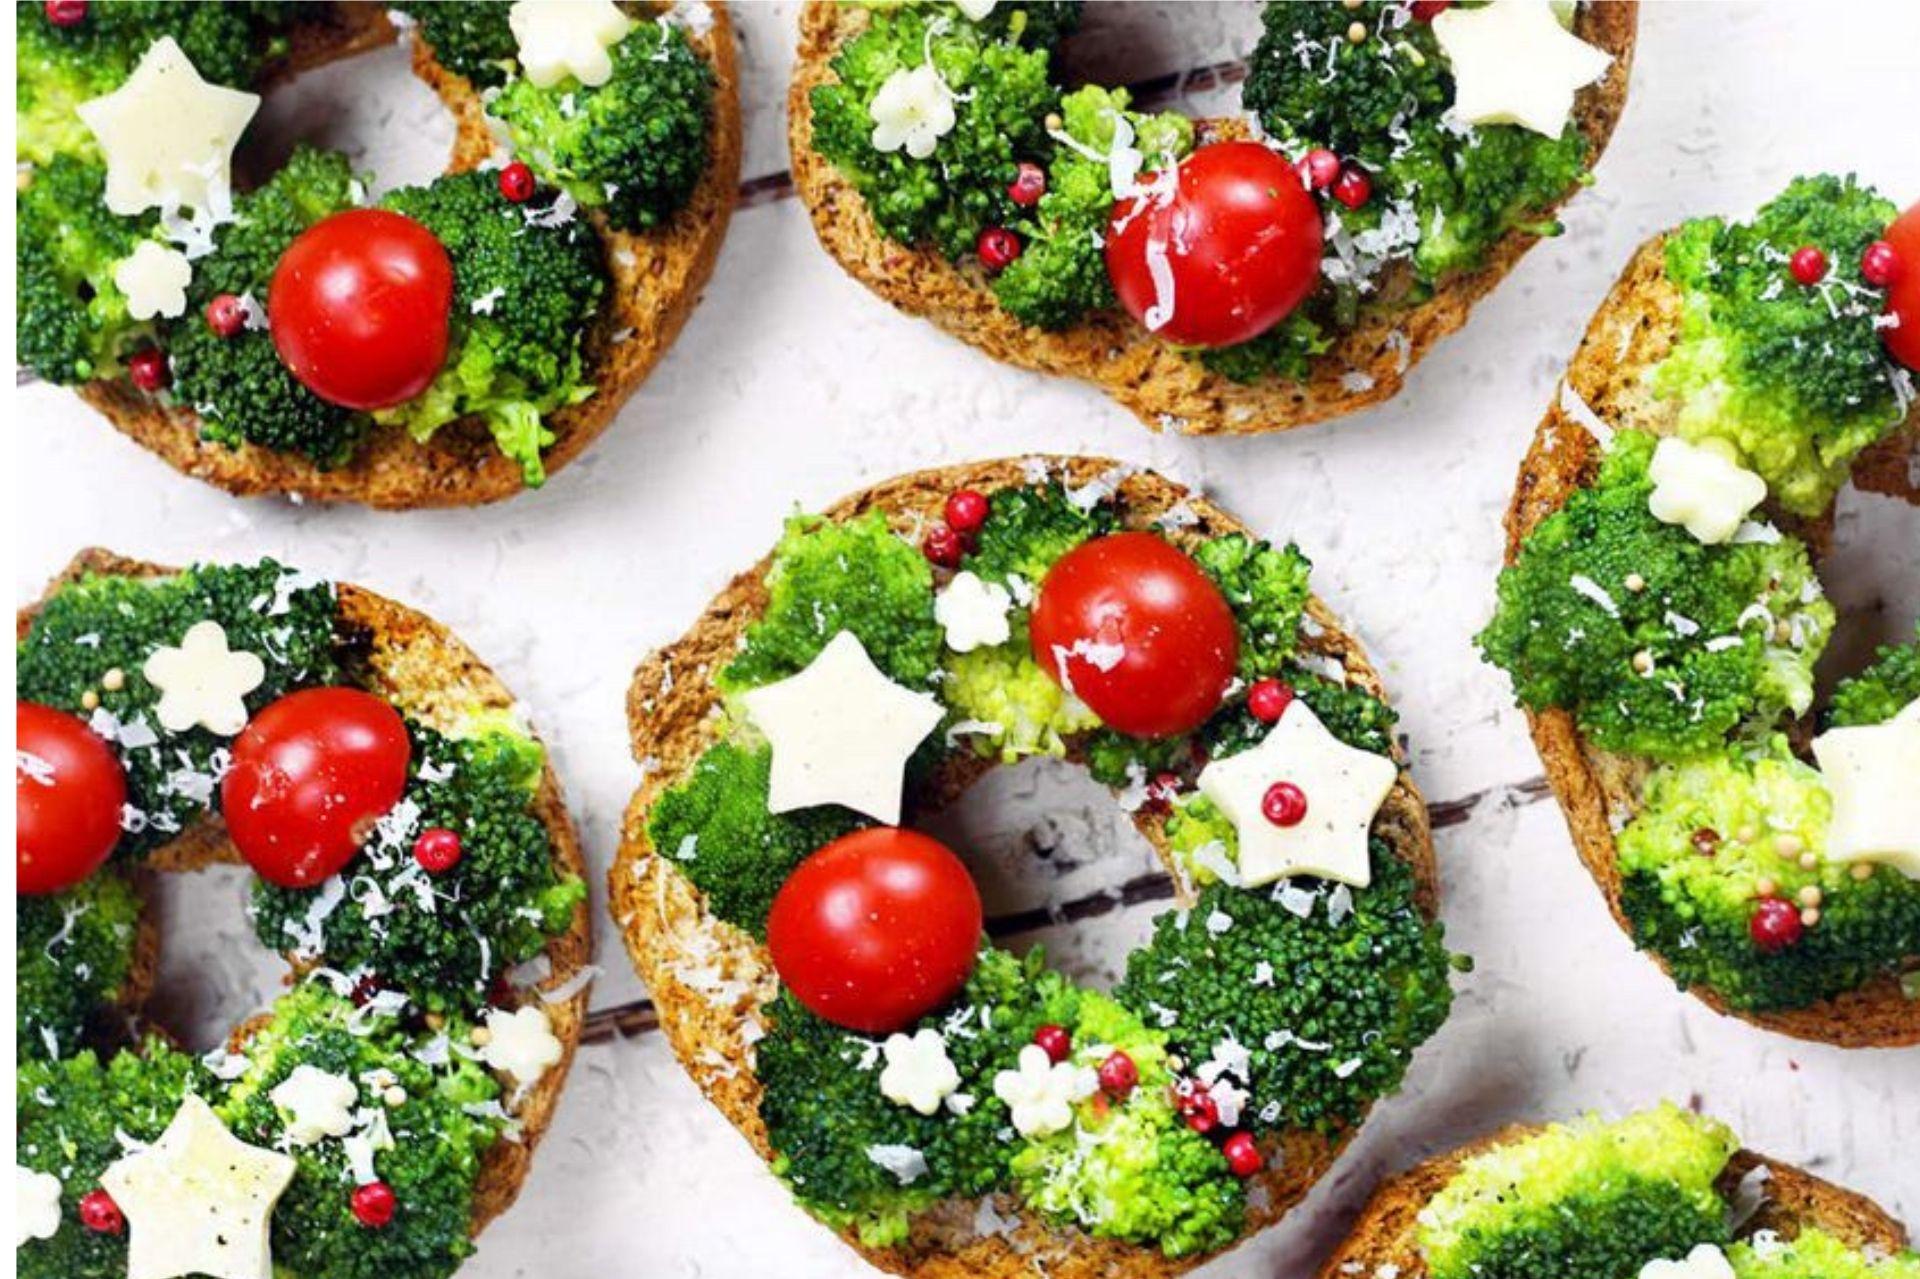 Antipasti Di Natale Grandi Chef.Antipasti Di Natale Pugliesi Bonta Del Sud Italia Food Blog